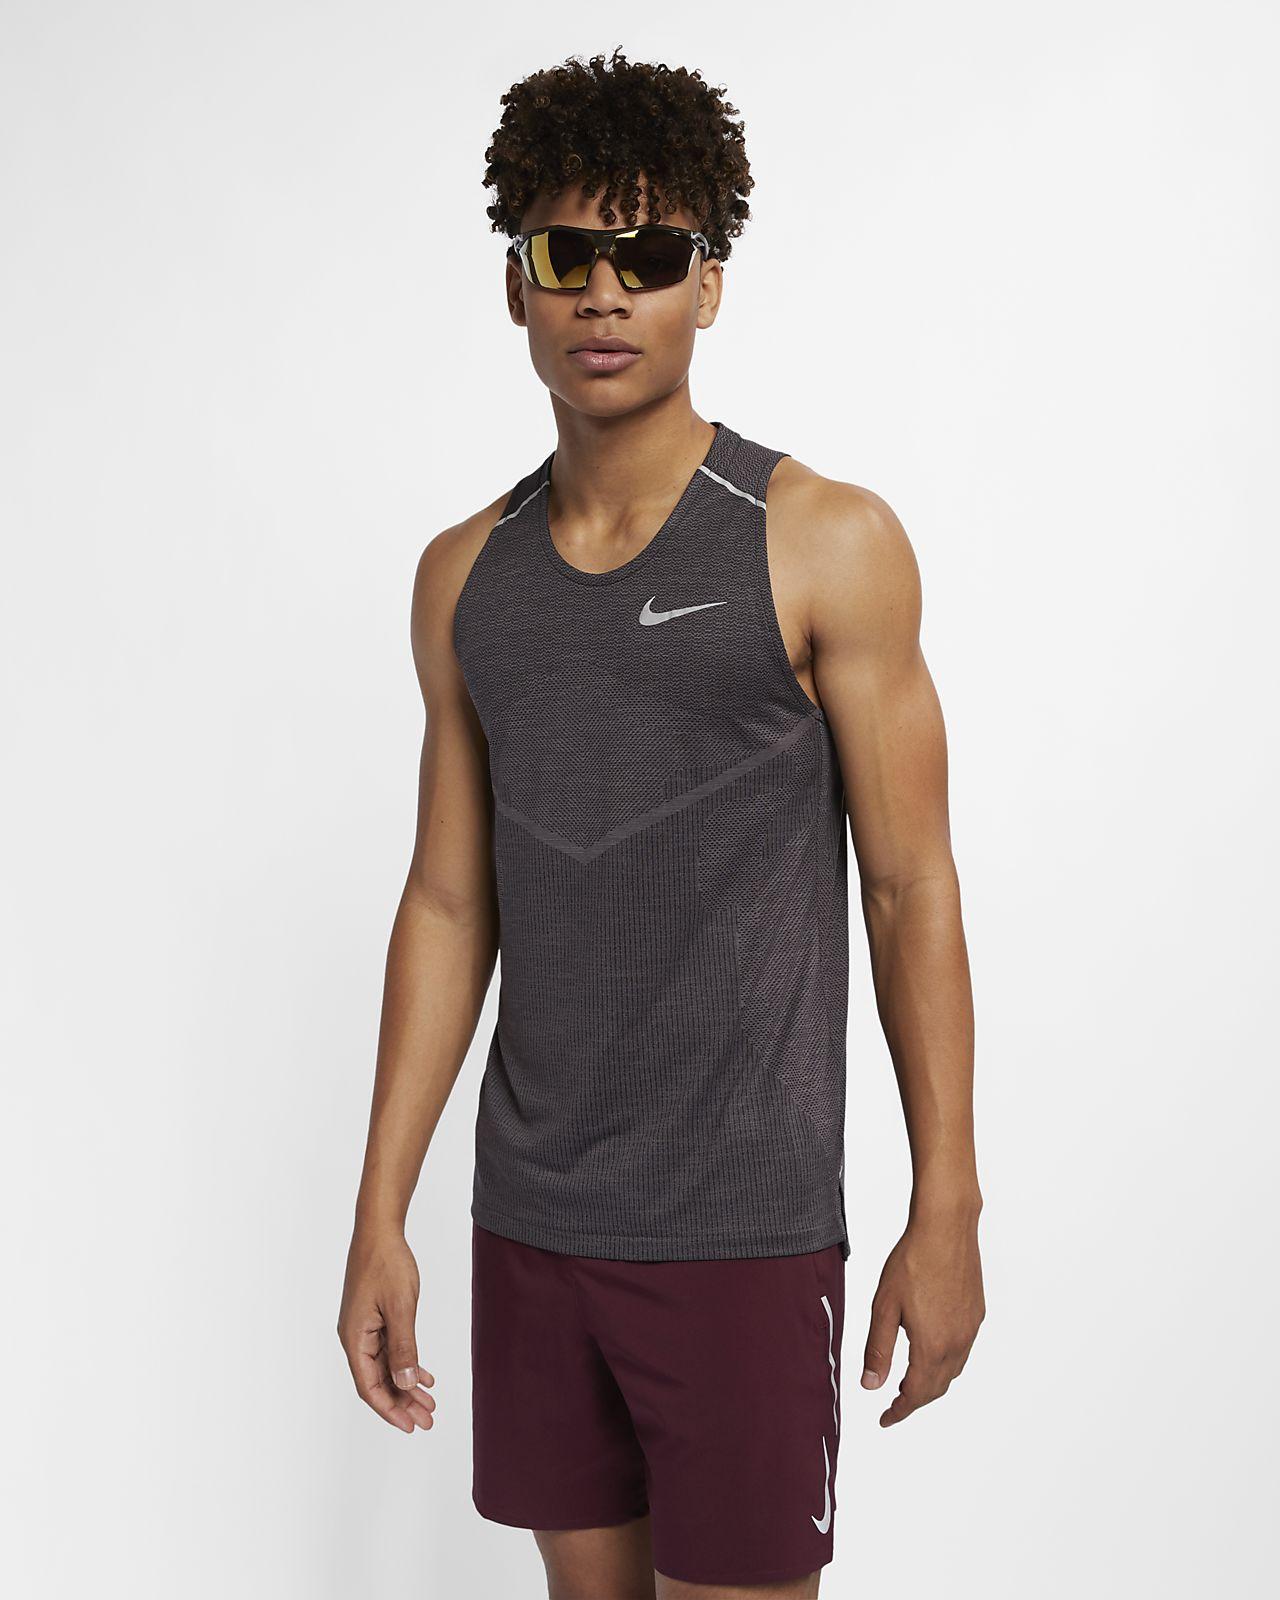 Nike TechKnit Cool Erkek Koşu Atleti